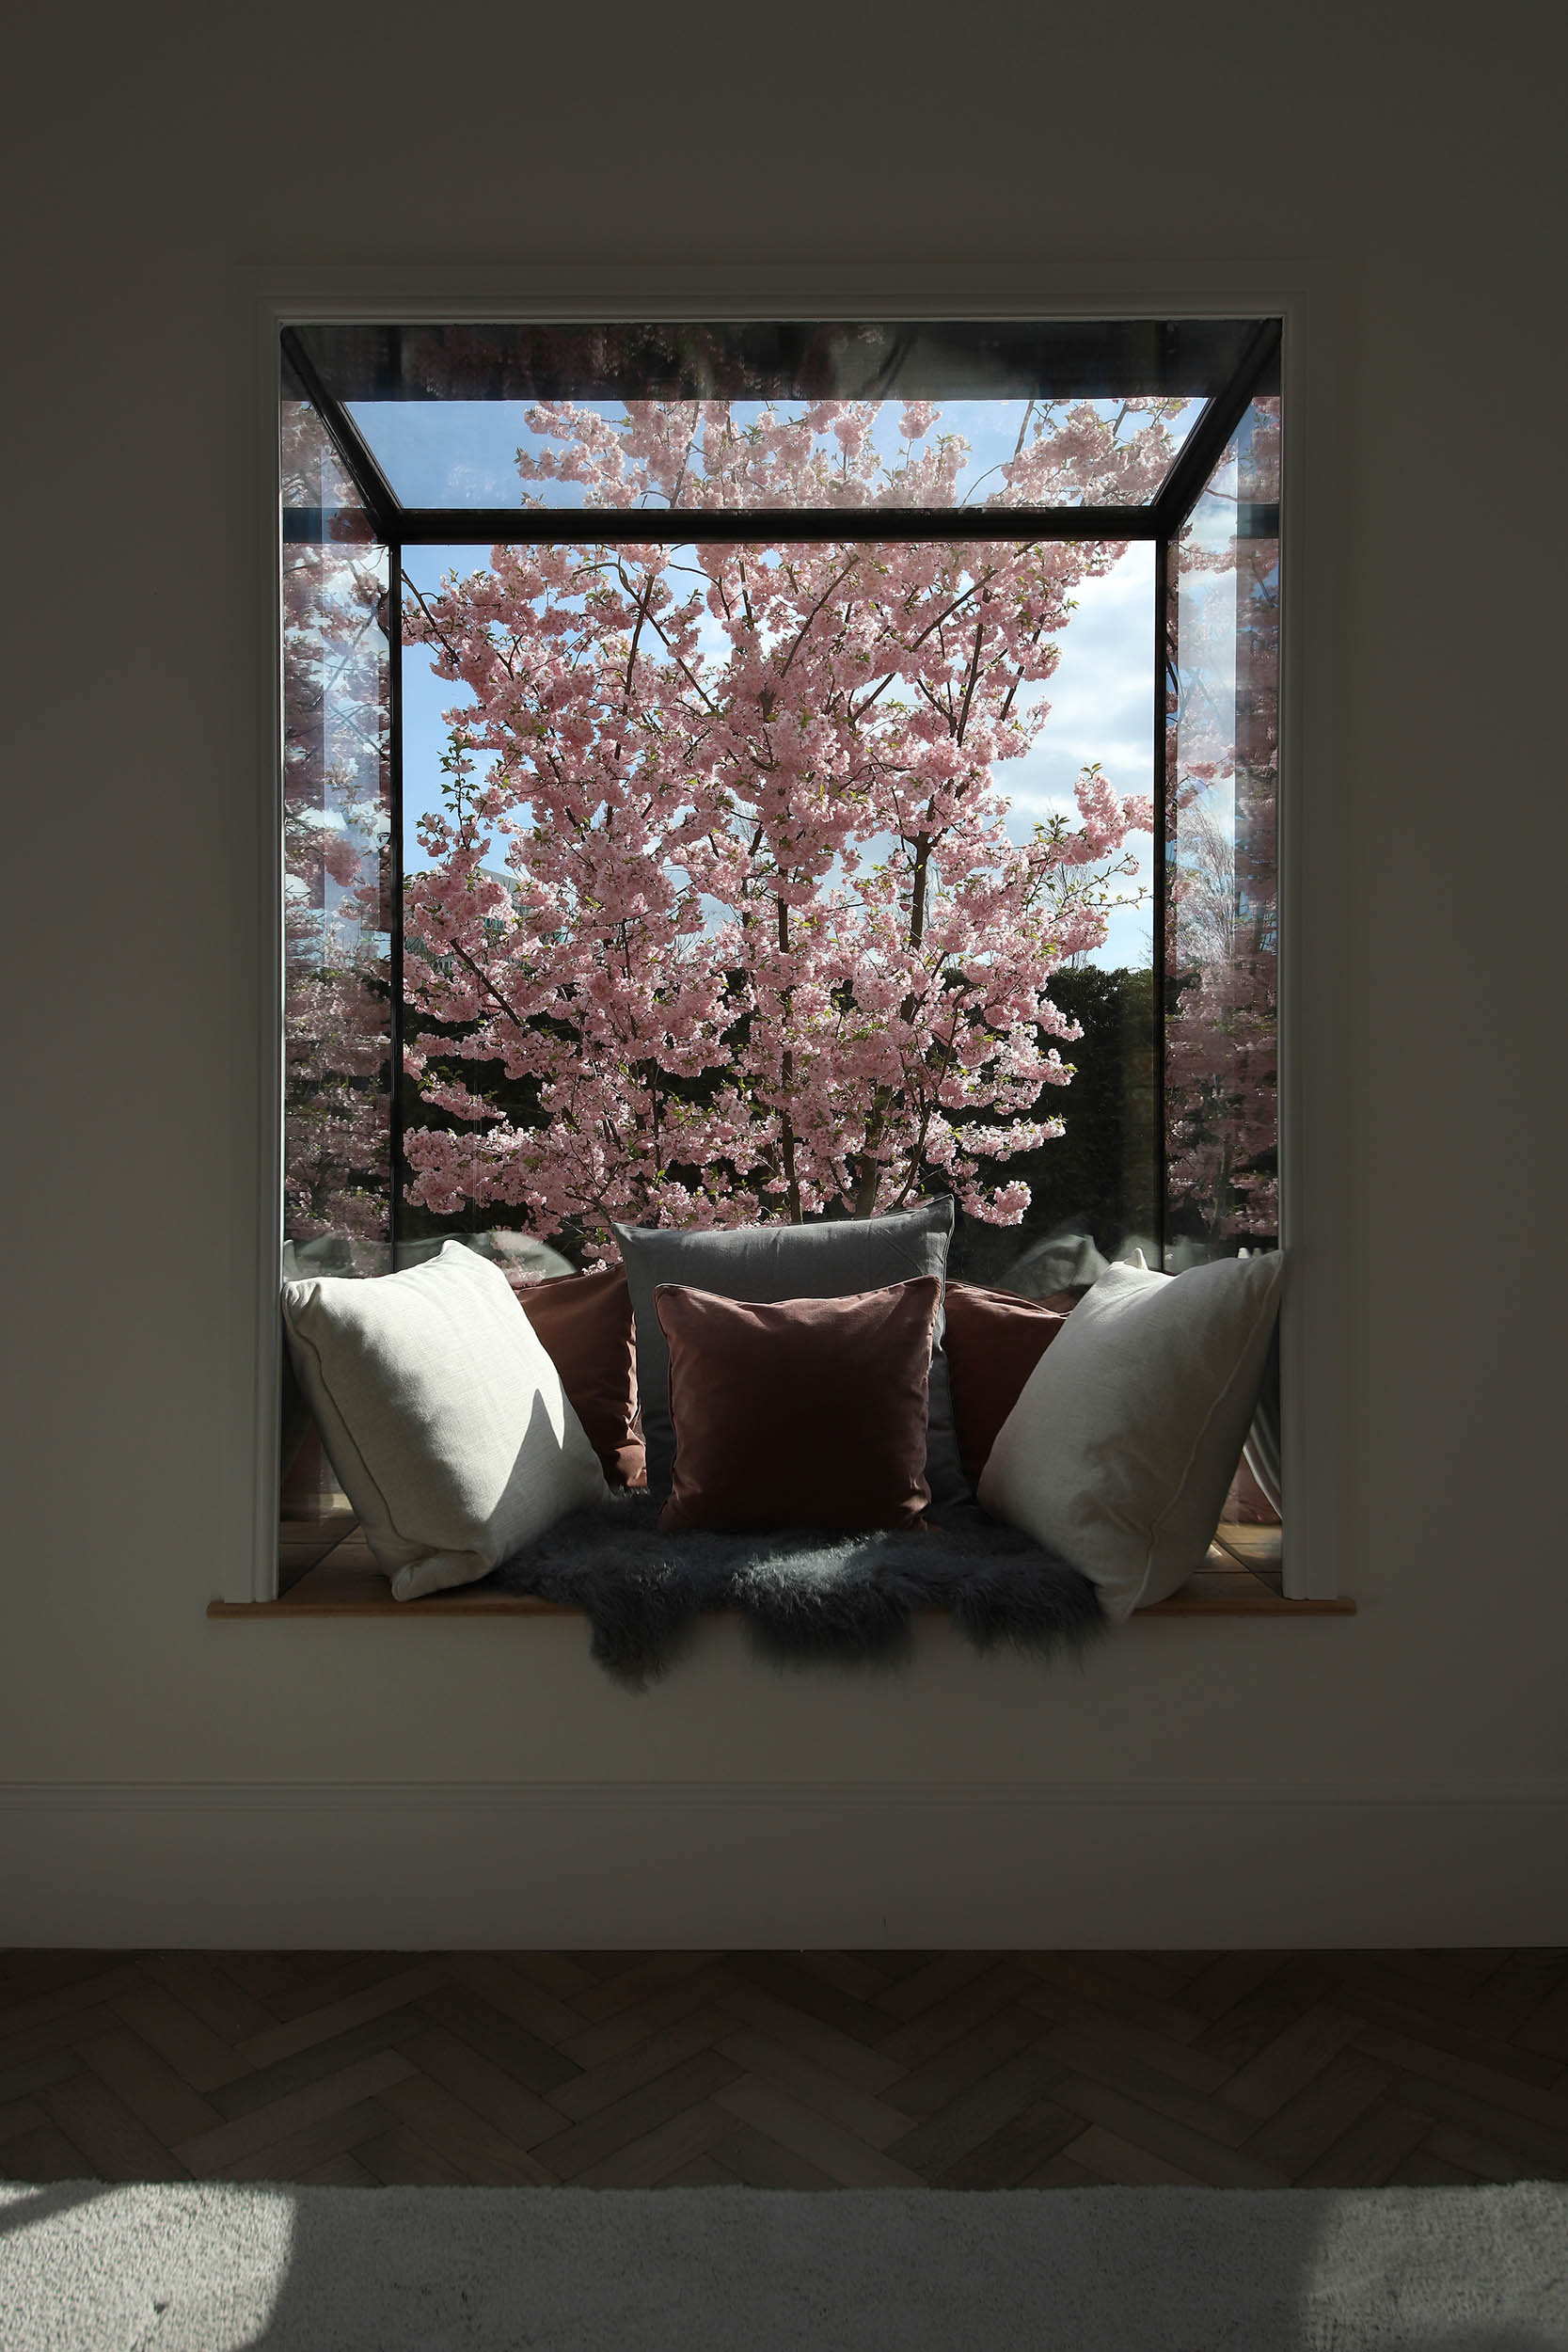 west-london-courtyard-oriel-window-sakura-blossom.jpg